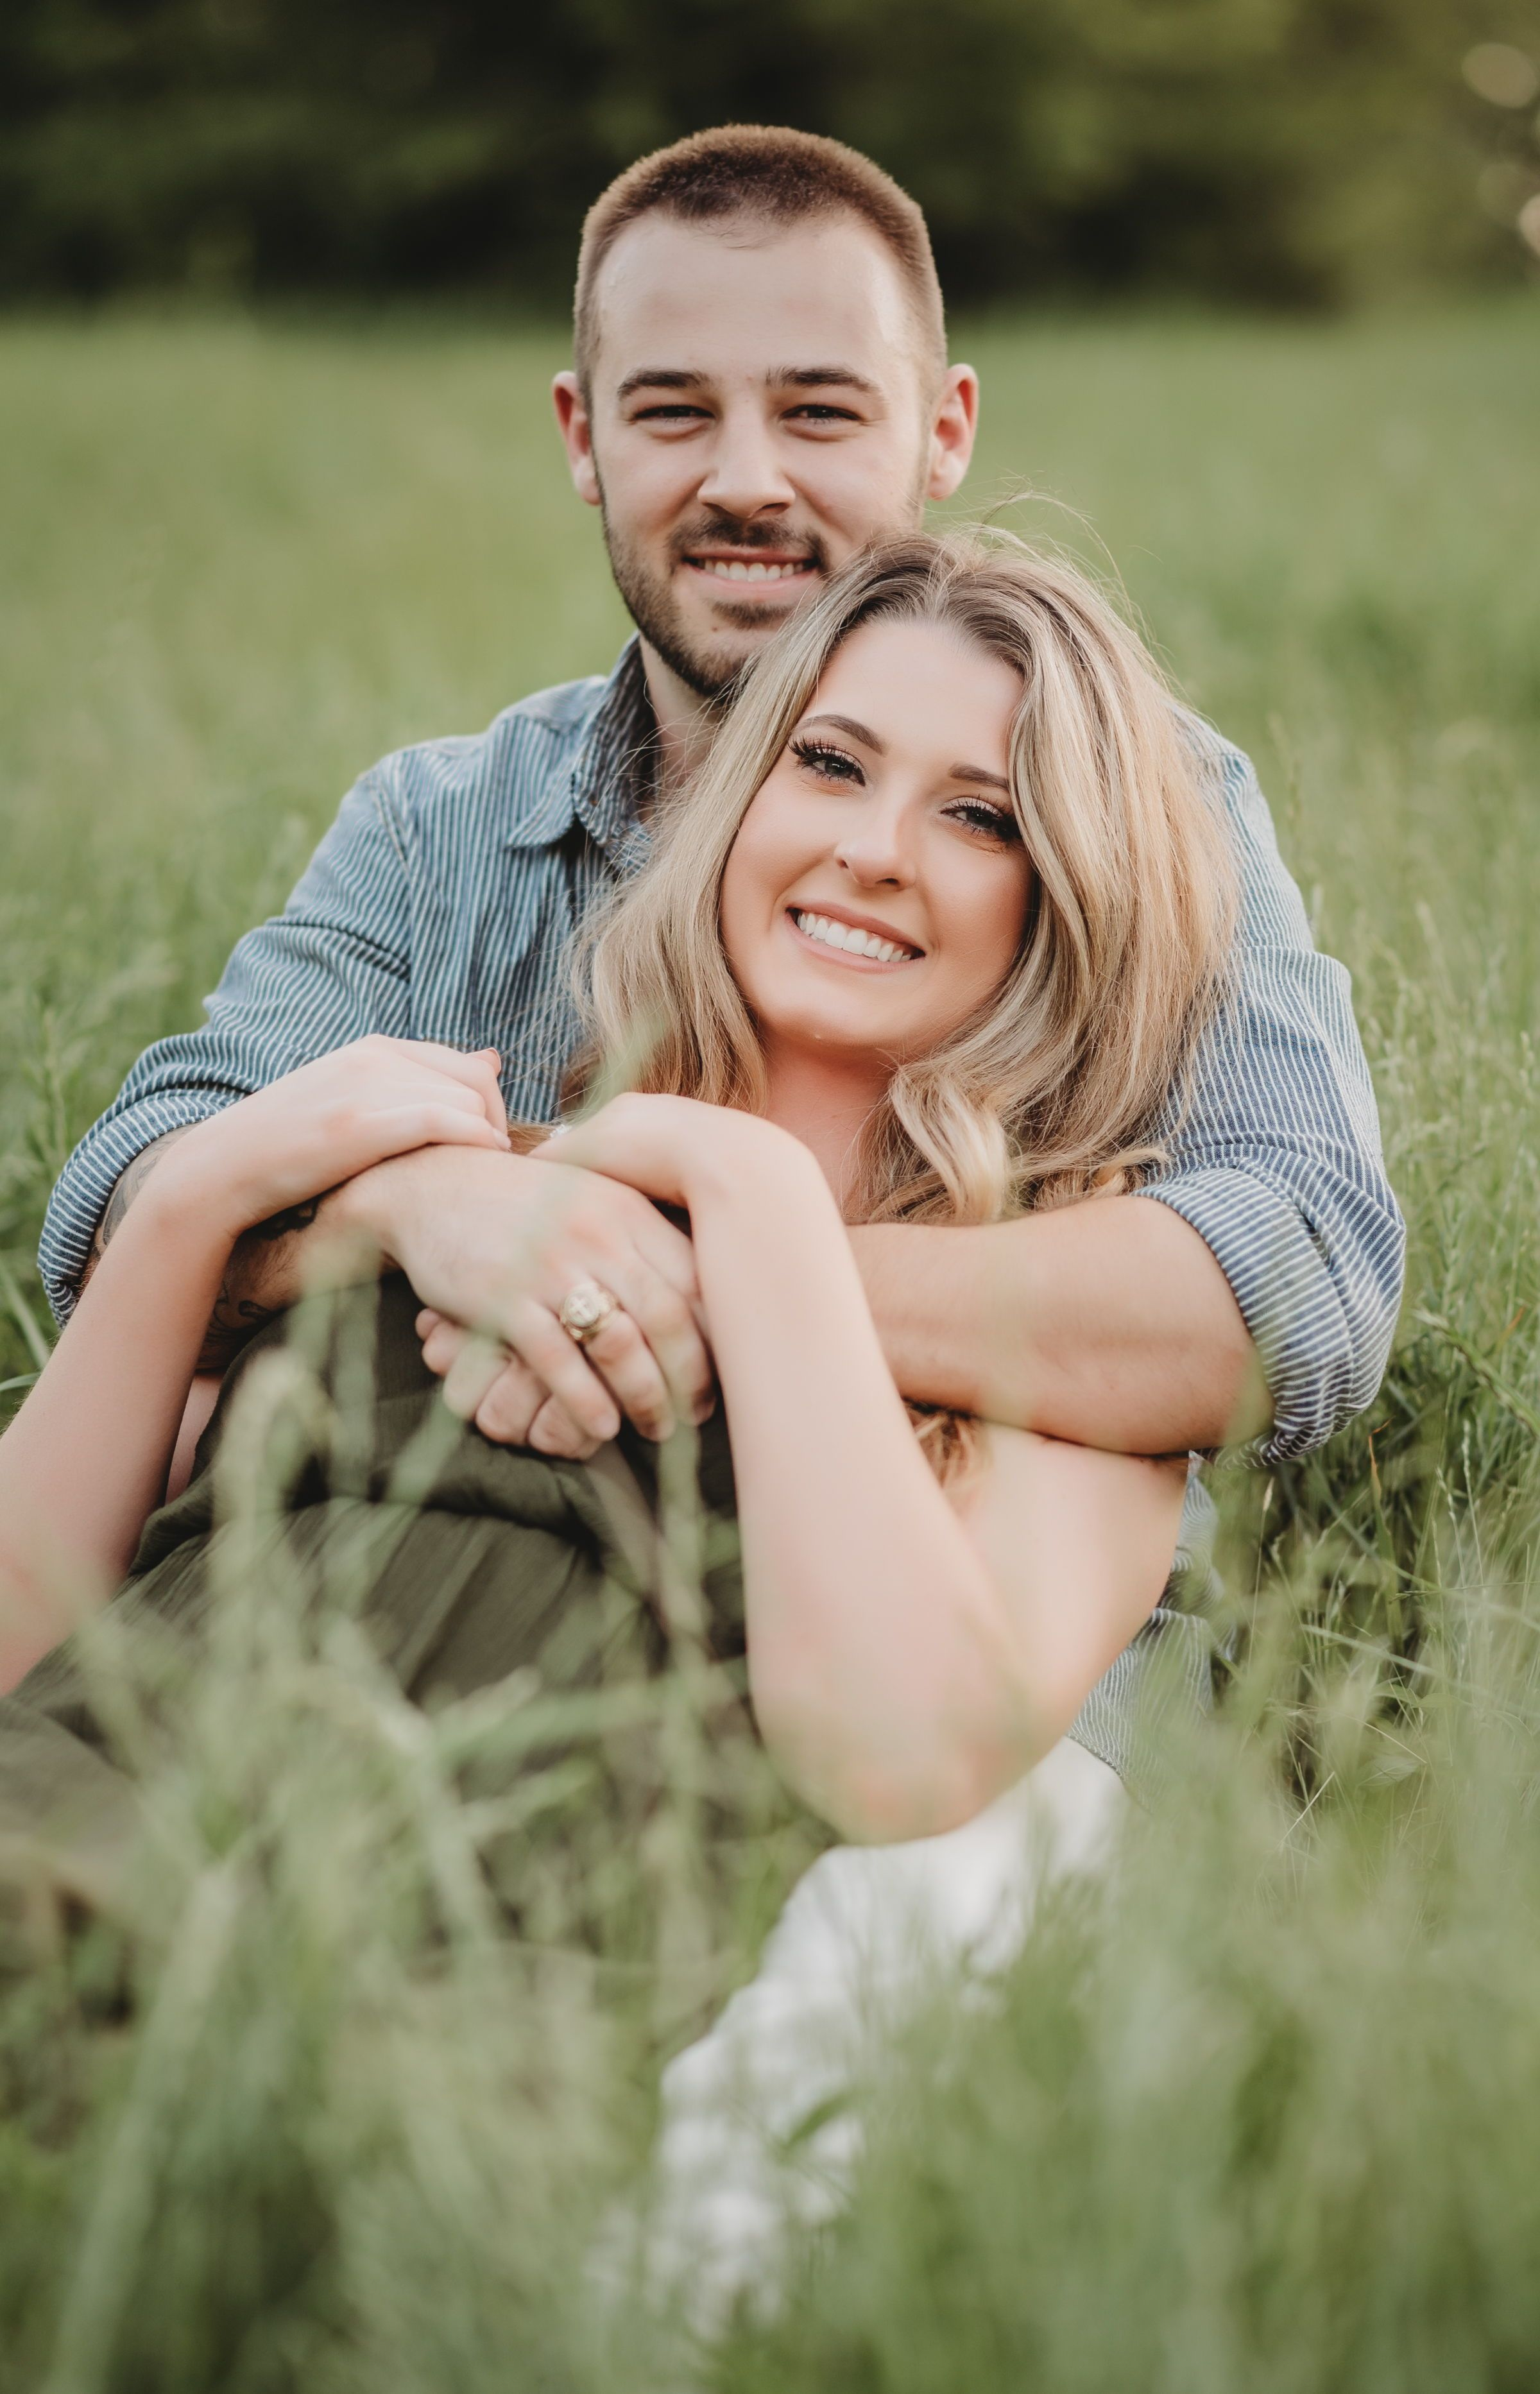 Spring Arbor Hills Engagement Photos Kyrstenashlayphotography Com In 2020 Dallas Engagement Photos Engagement Photos Dallas Wedding Photographers